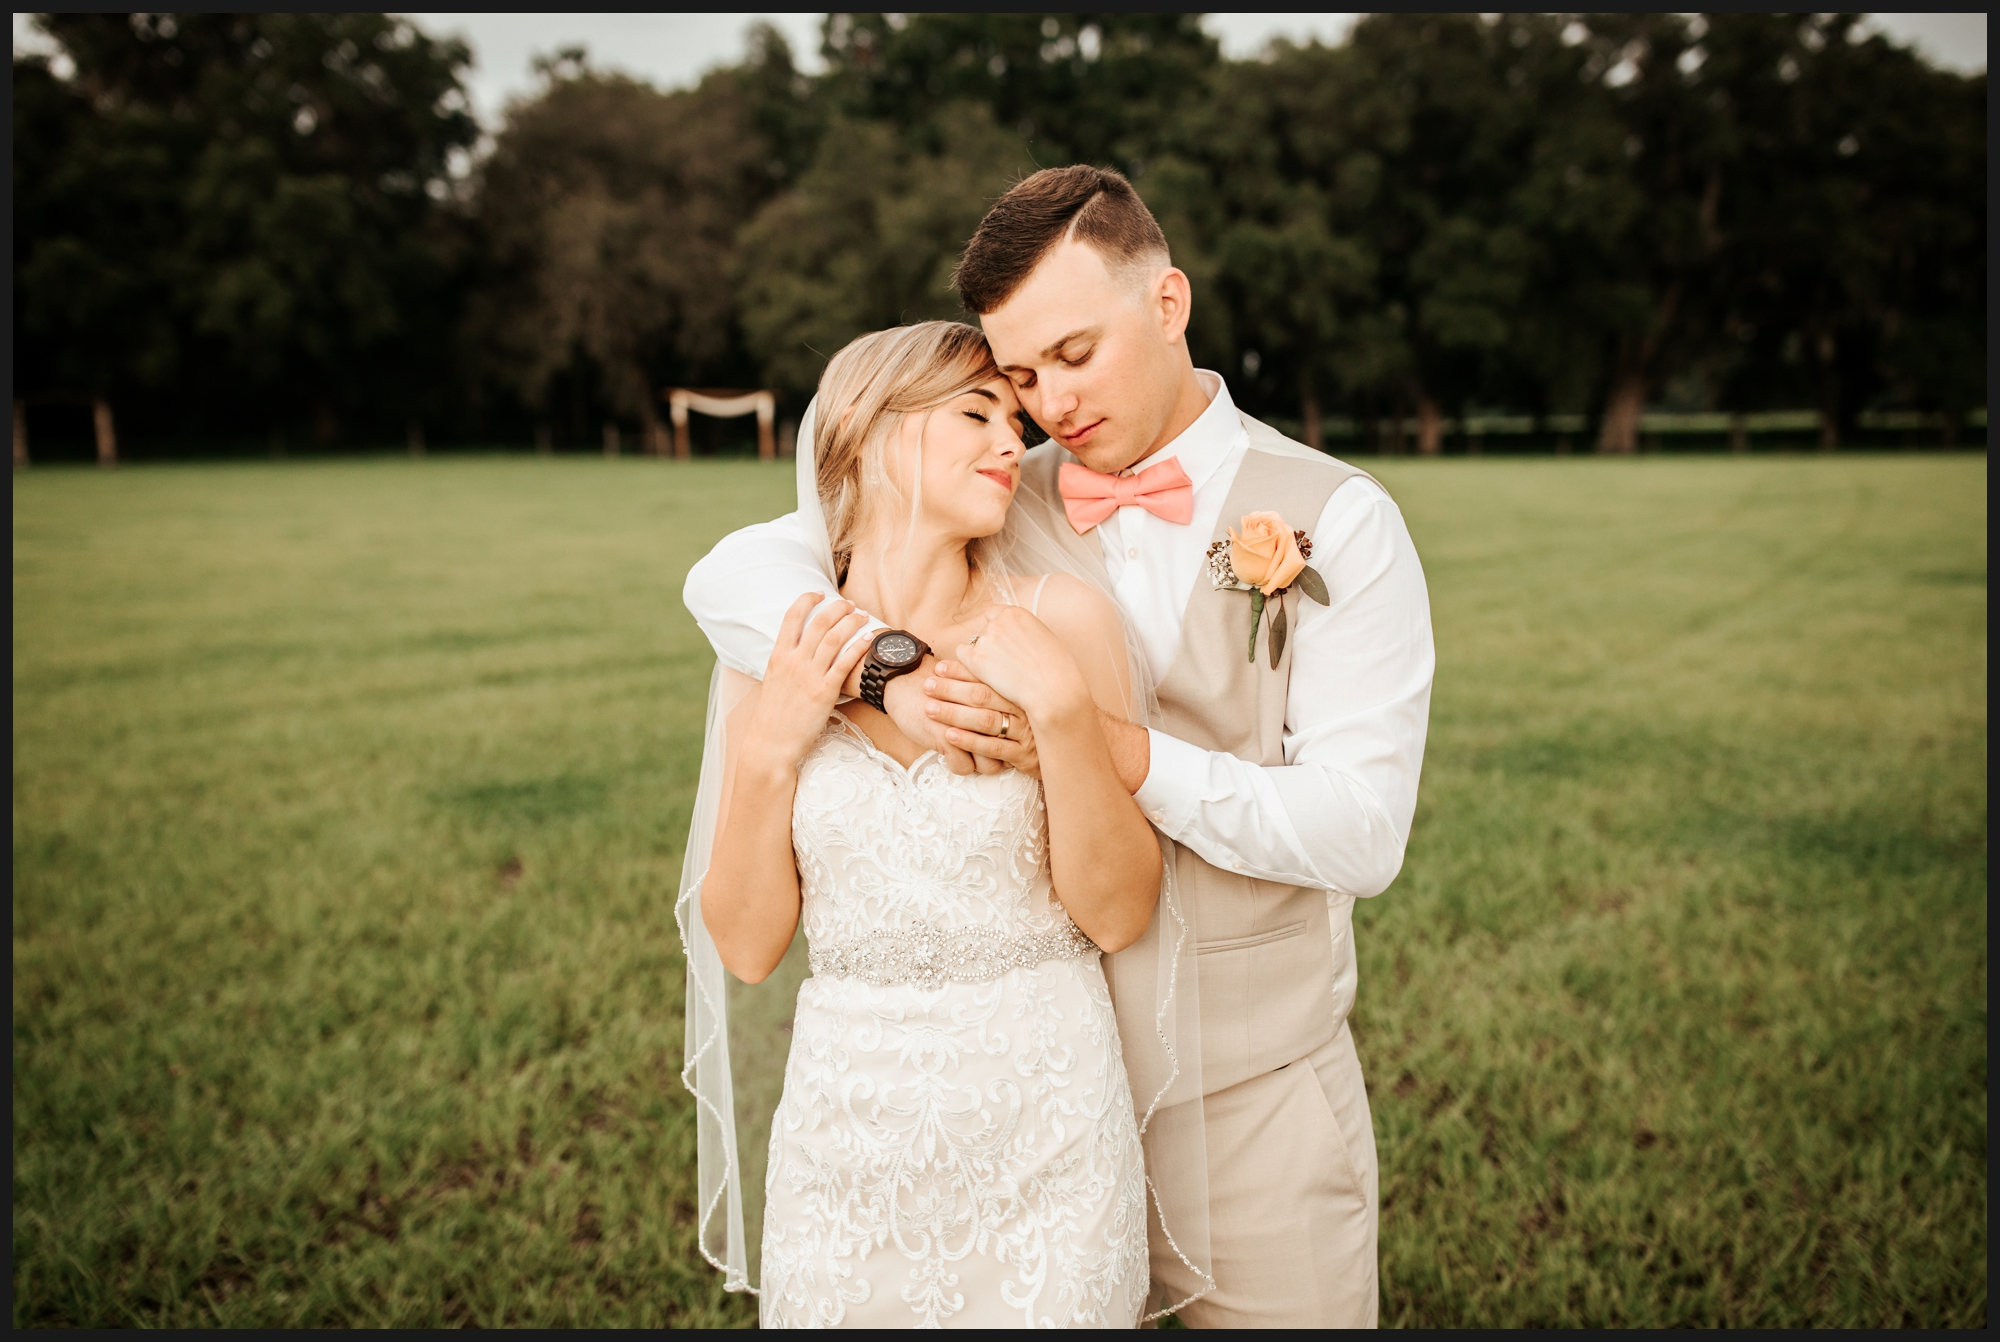 Orlando-Wedding-Photographer-destination-wedding-photographer-florida-wedding-photographer-hawaii-wedding-photographer_0314.jpg